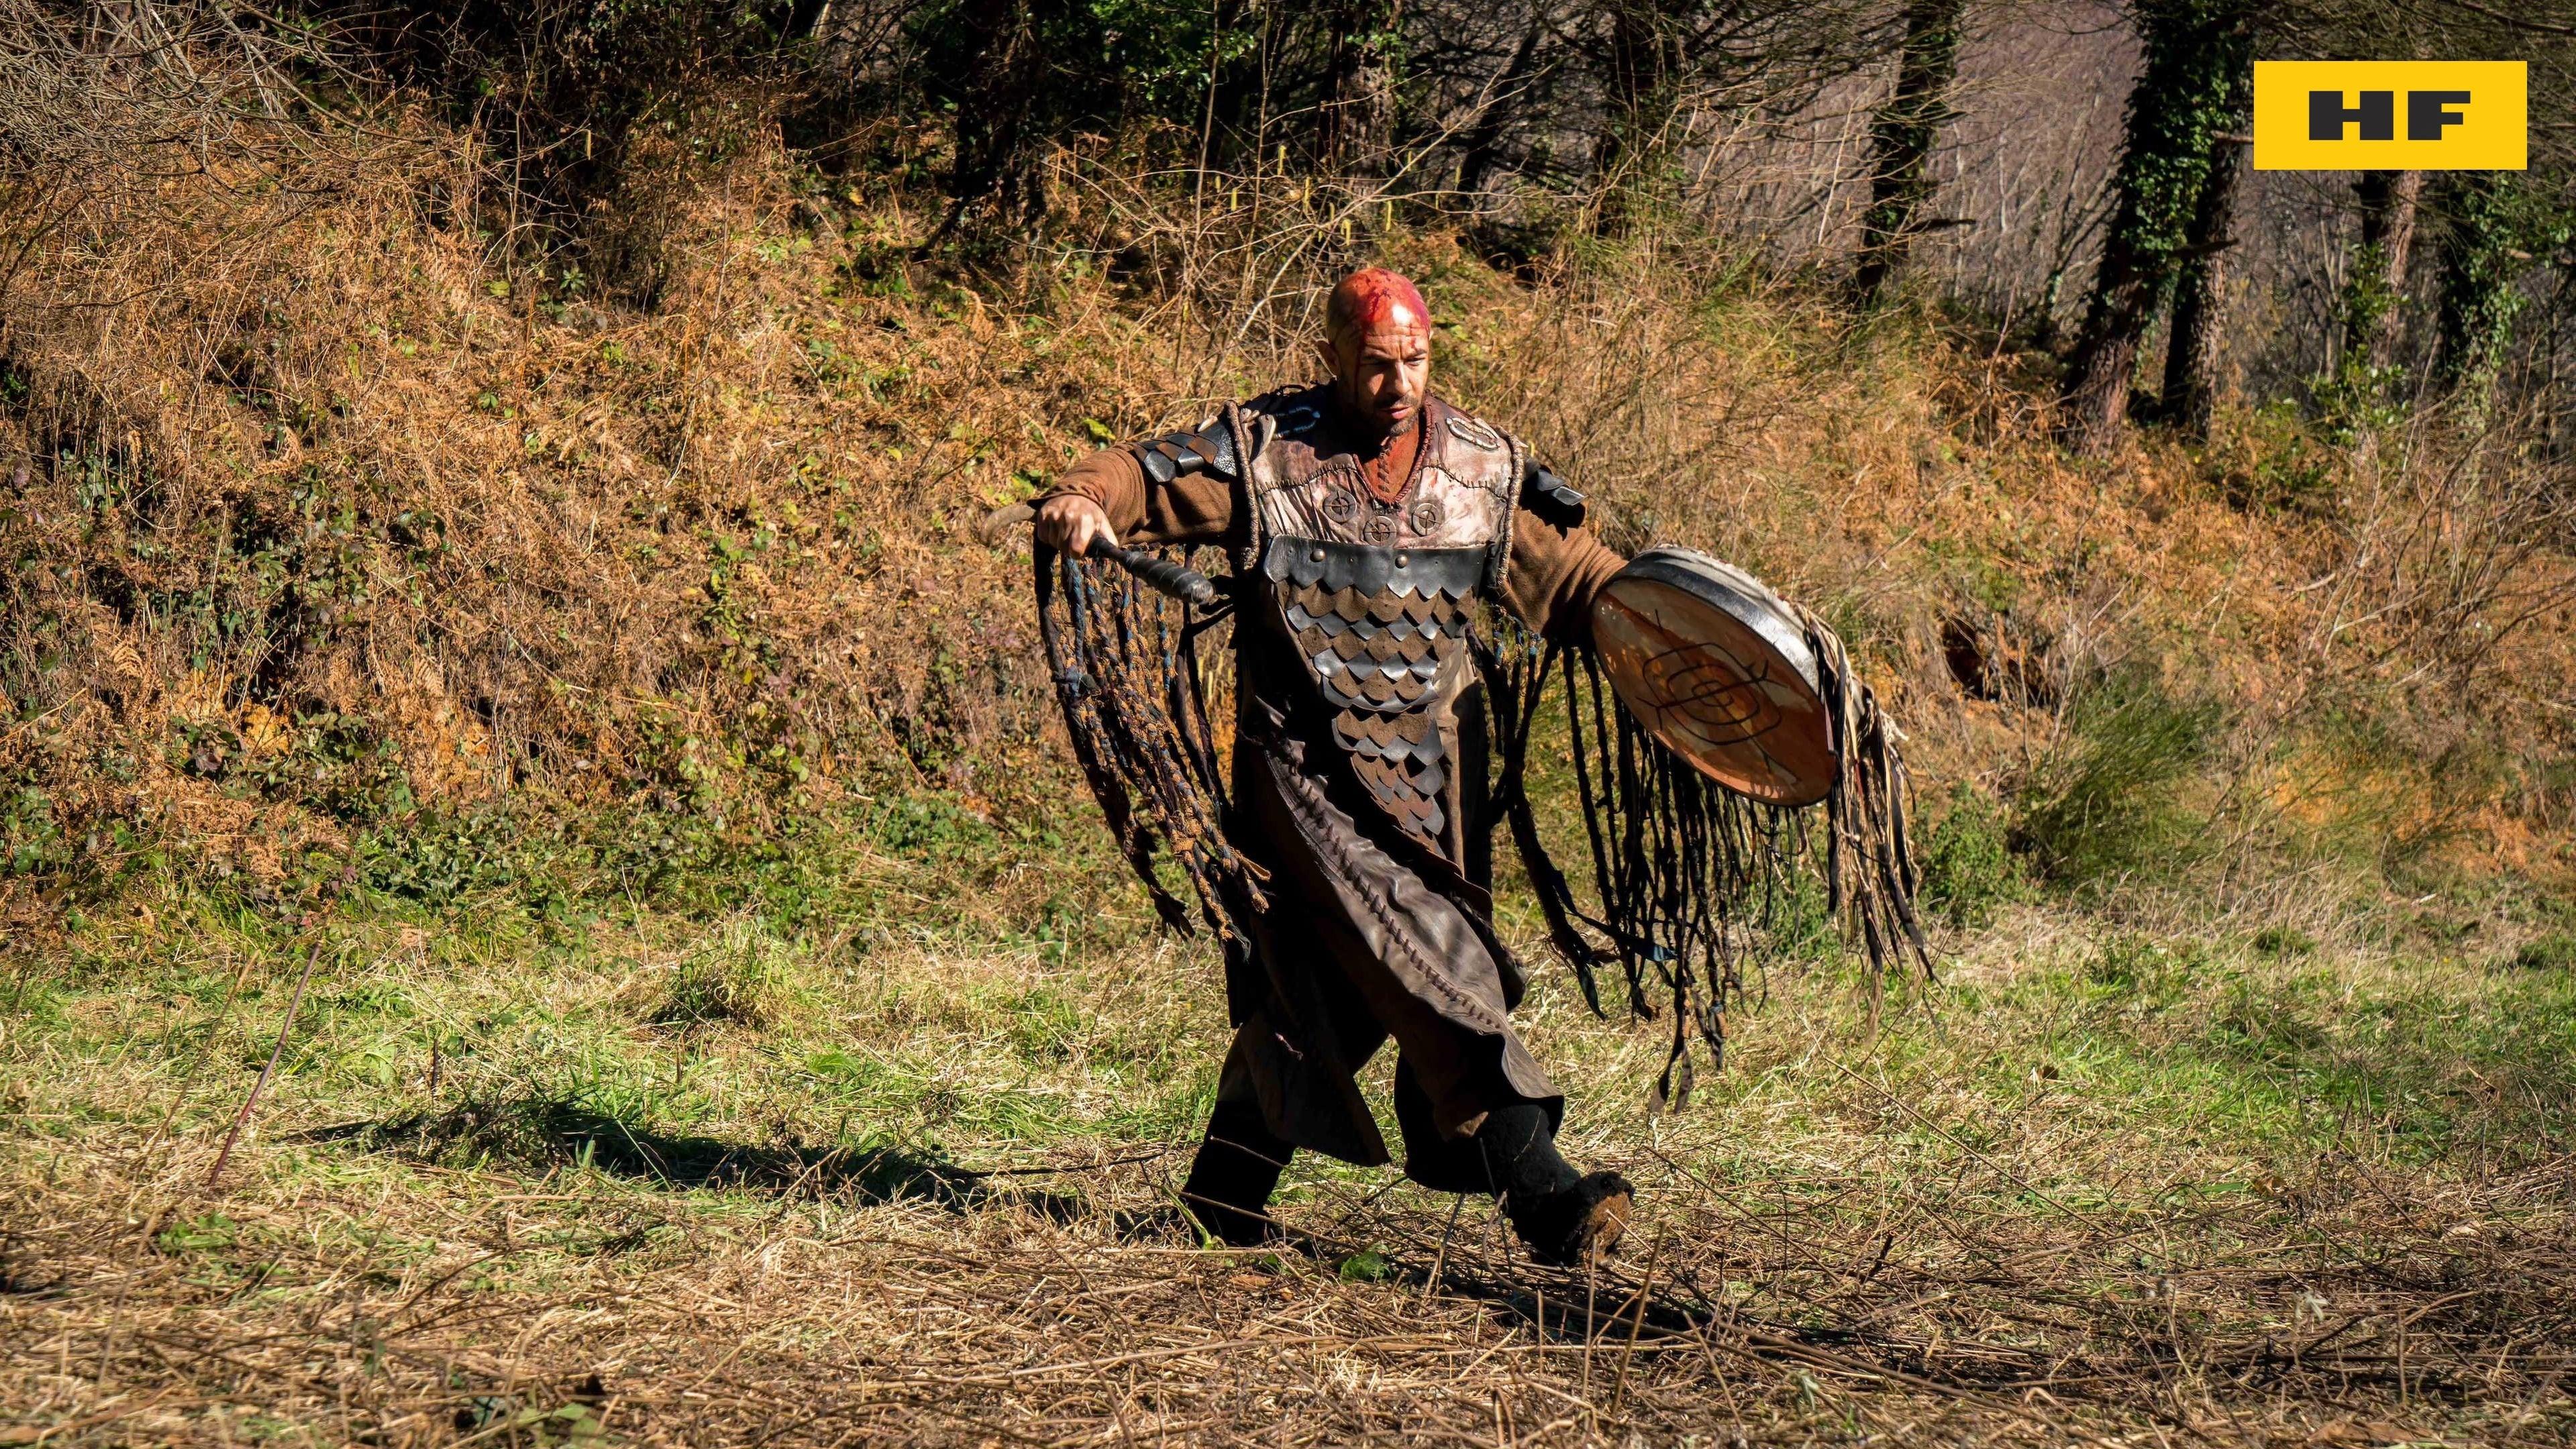 Watch Dirilis Ertugrul season 2 Episode 21 - Historical Fun TV